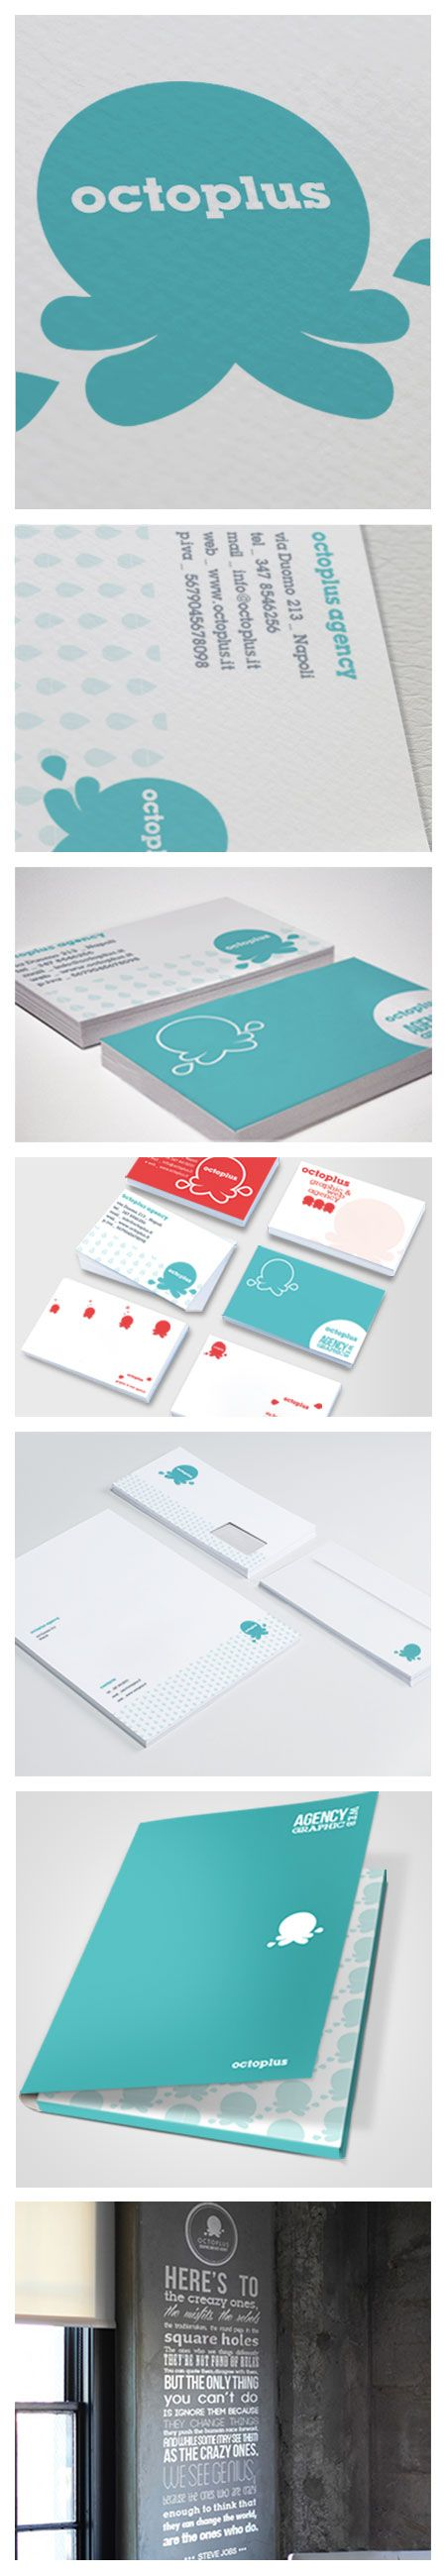   #Business #Card #letterpress #creative #paper #businesscard #corporate #design #visitenkarte #corporatedesign < repinned by www.BlickeDeeler.de   Have a look on www.LogoGestaltung-Hamburg.de